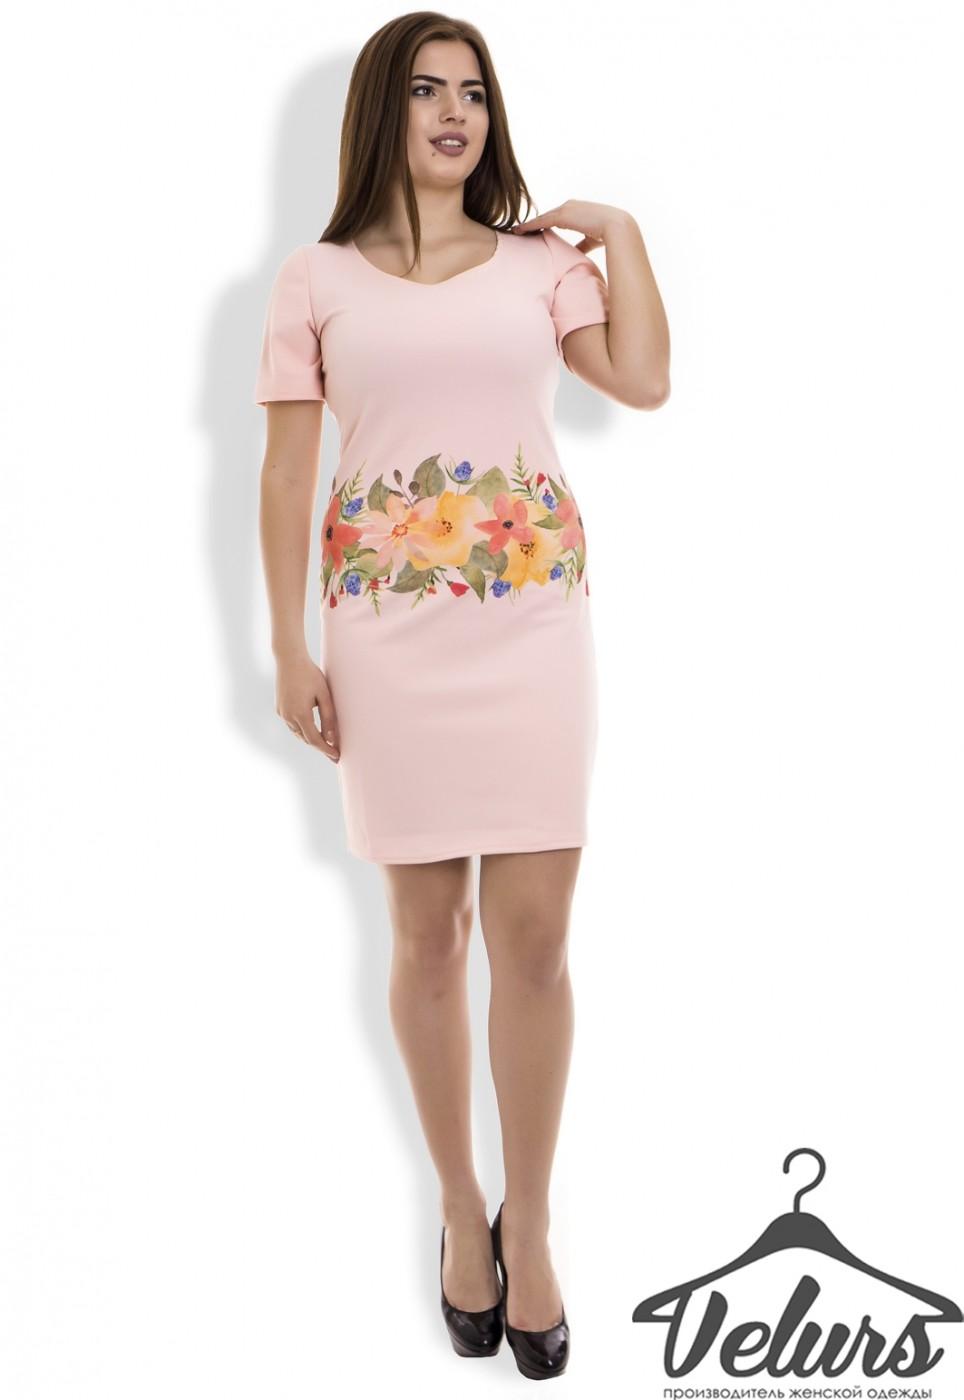 Velurs: Платье 212126 - фото 10